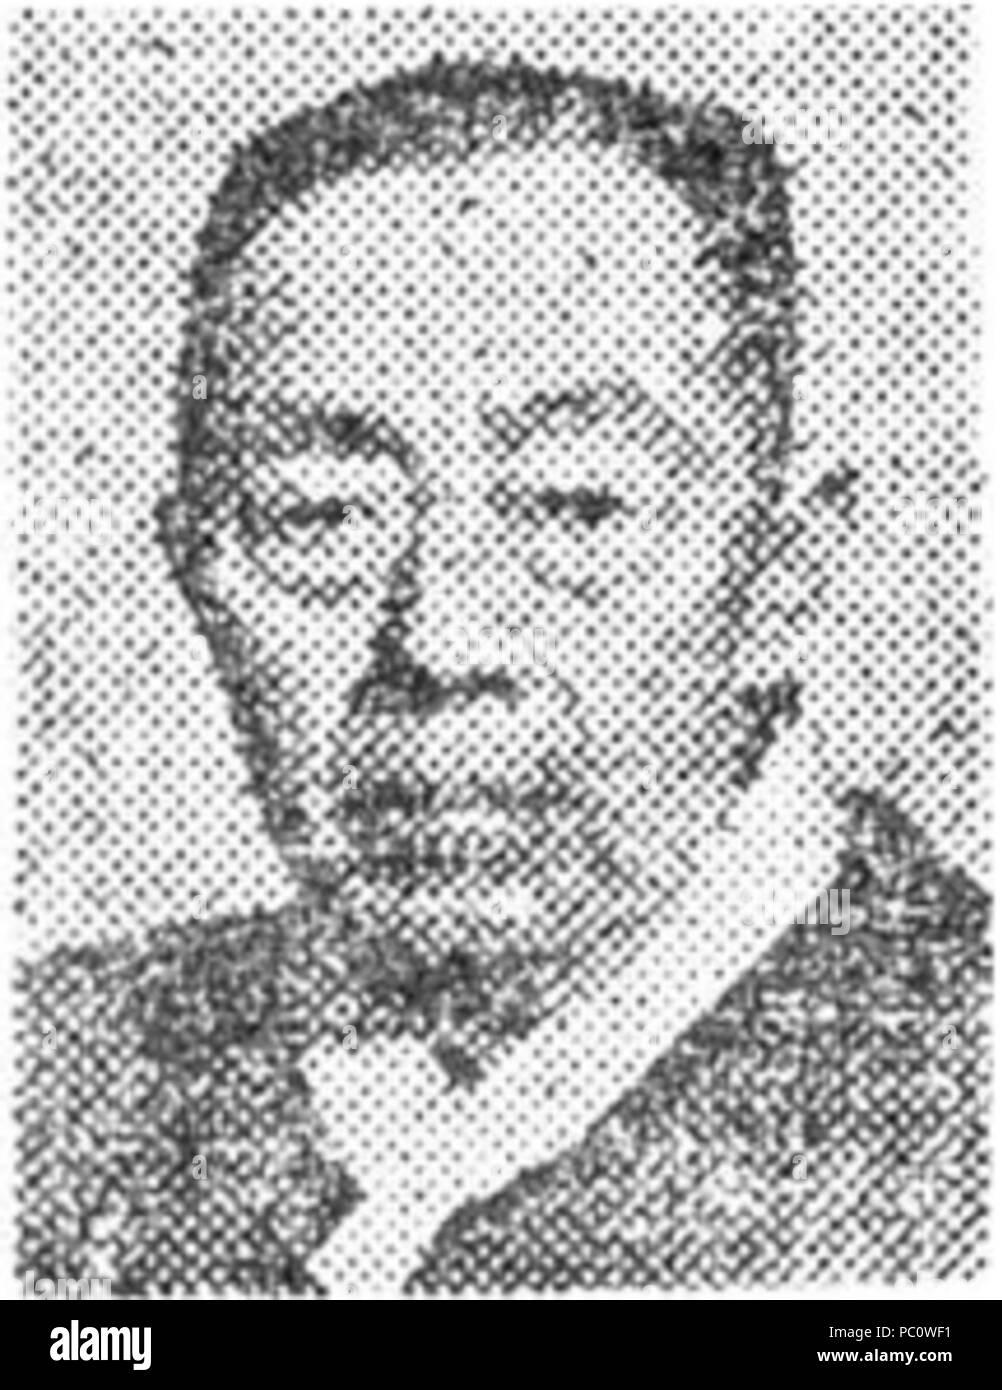 340 Kim Kyu-sik en 194701 Photo Stock